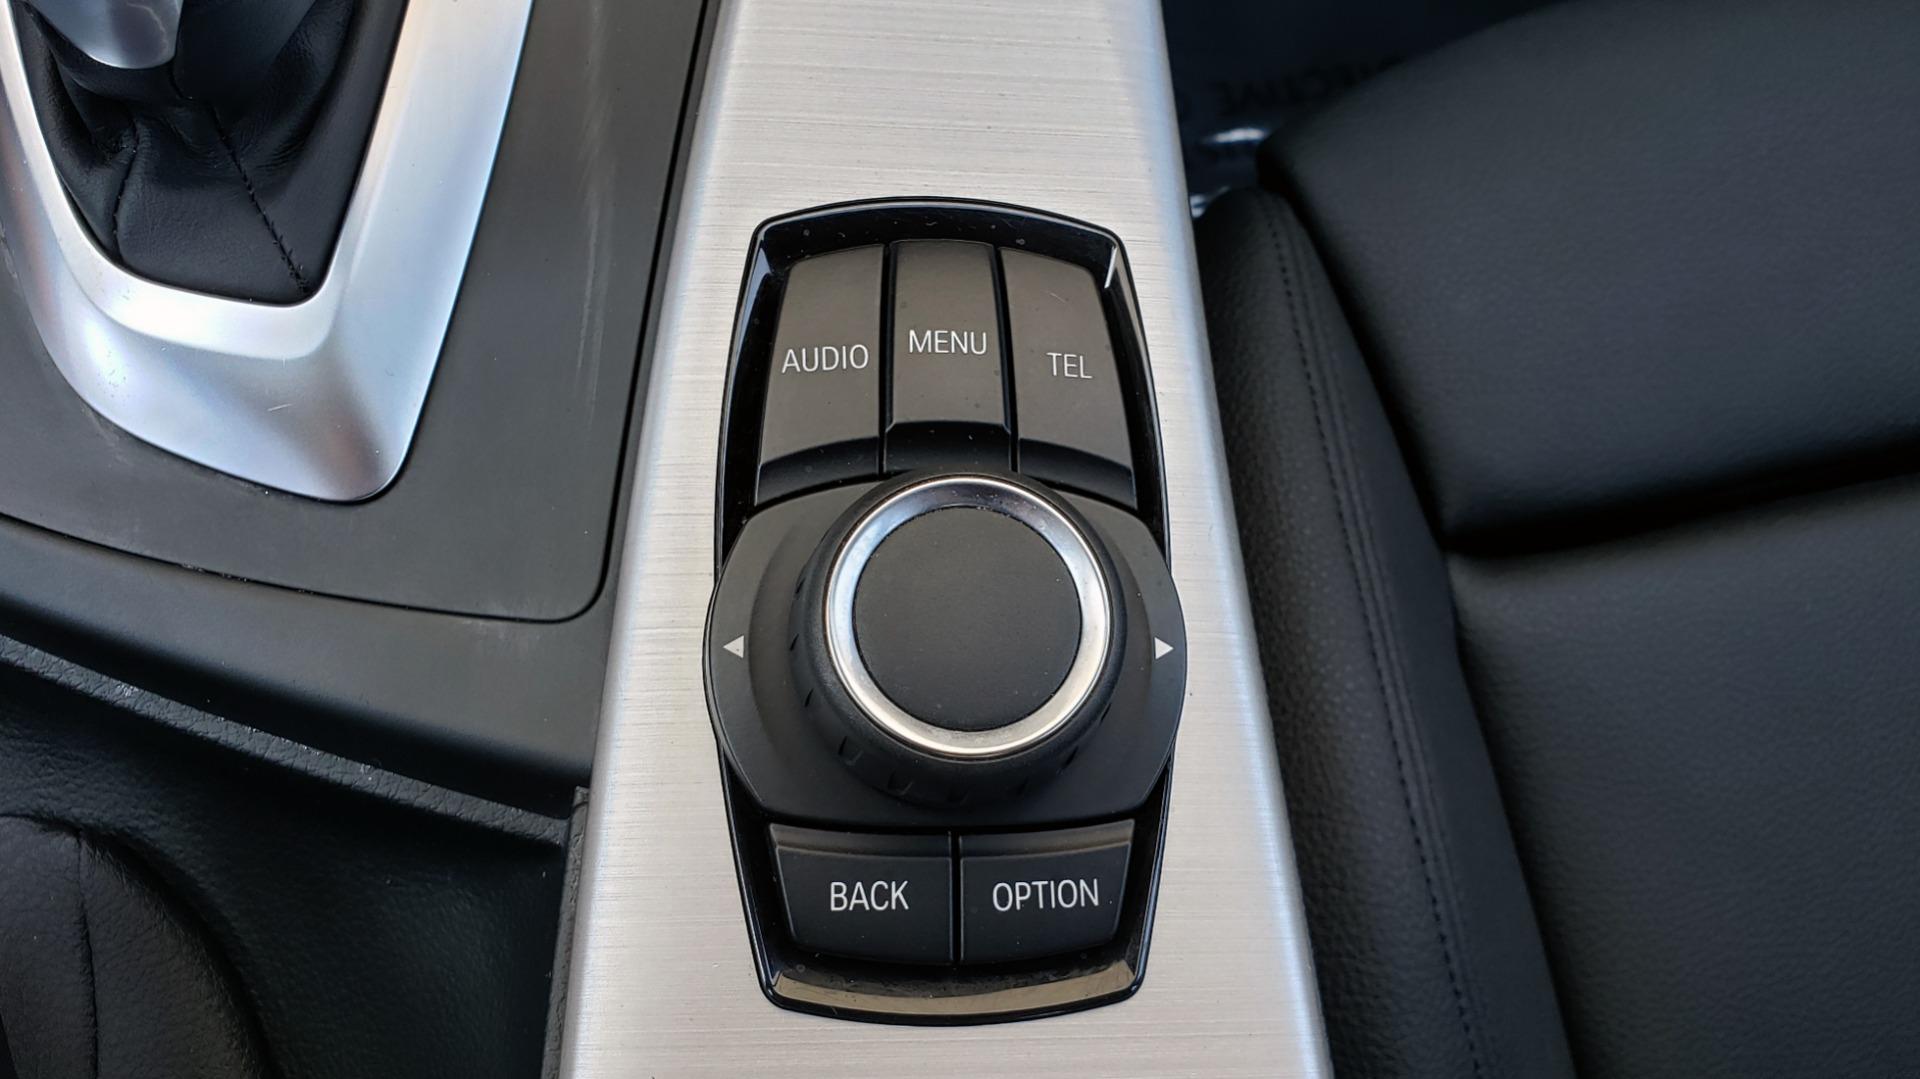 Used 2017 BMW 3 SERIES 330I SPORT SEDAN / DRVR ASST PKG / SUNROOF / REARVIEW for sale Sold at Formula Imports in Charlotte NC 28227 47